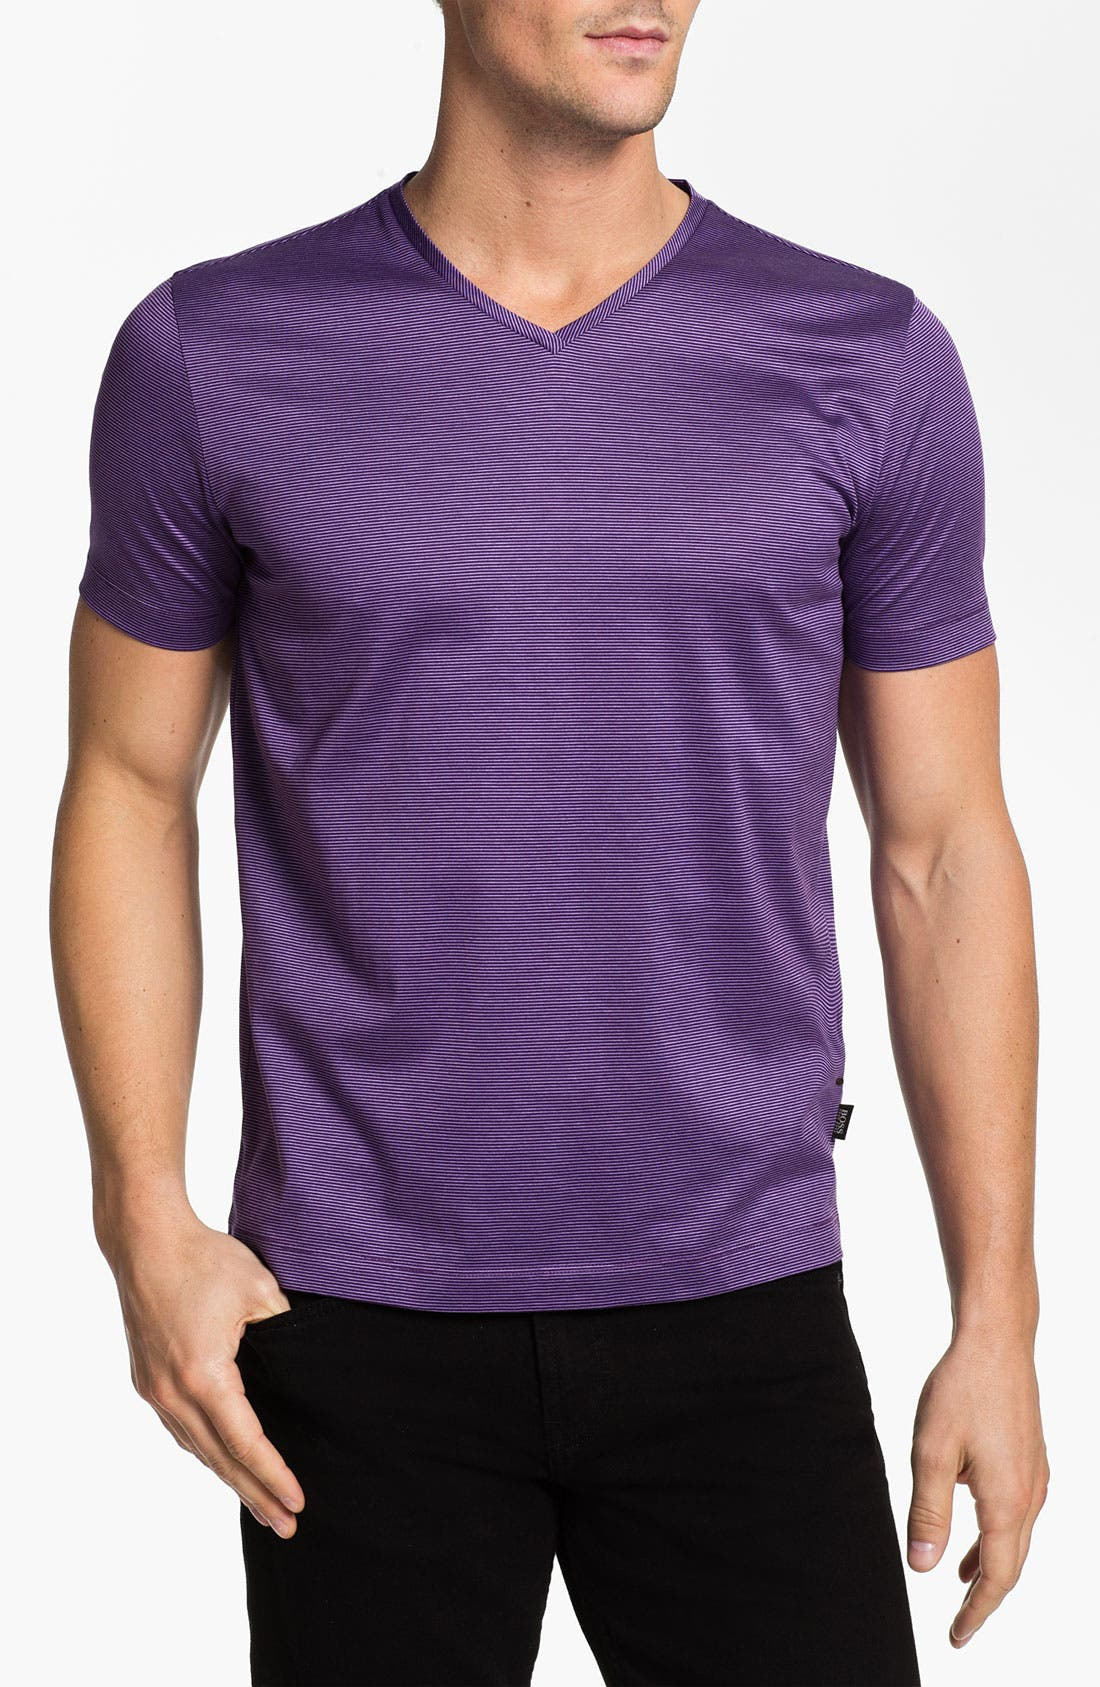 Main Image - BOSS HUGO BOSS 'Eraldo' Regular Fit V-Neck T-Shirt